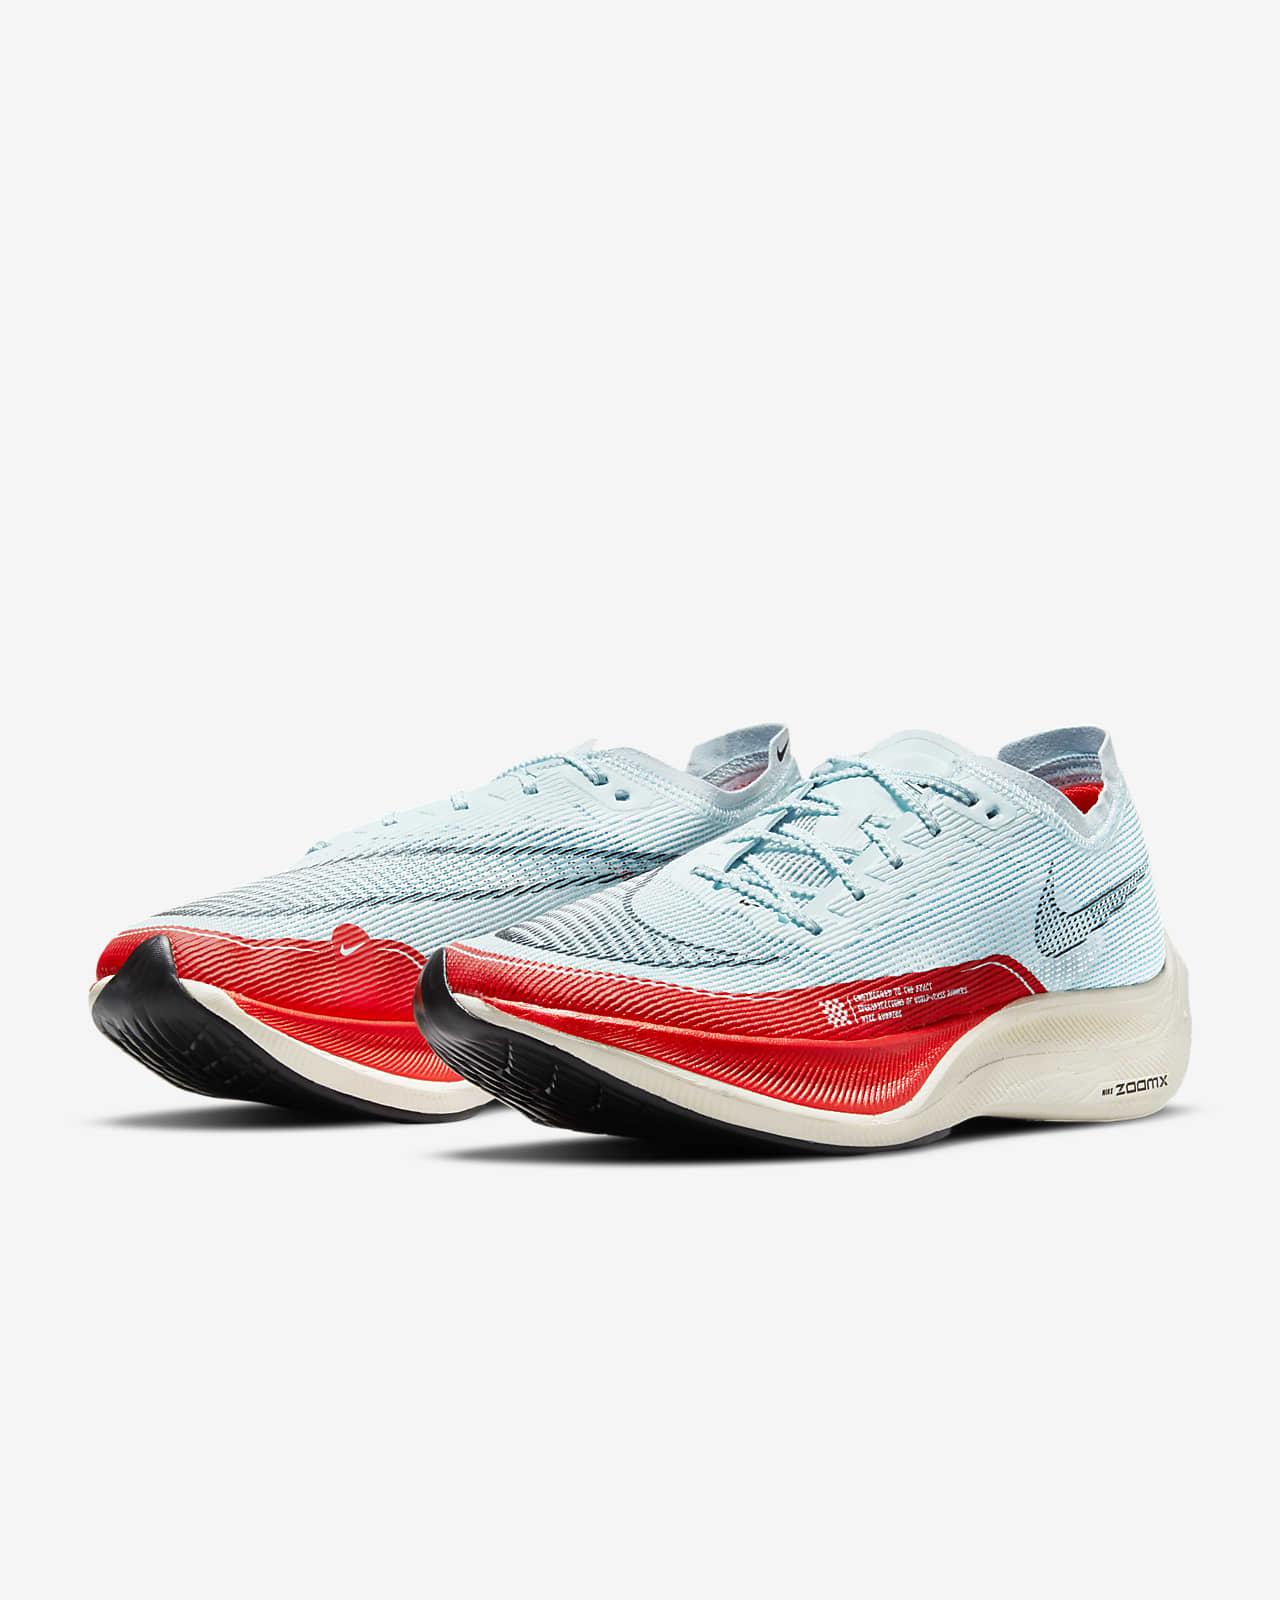 Chaussures de course Nike ZoomX Vaporfly Next% 2 « OG » pour Homme